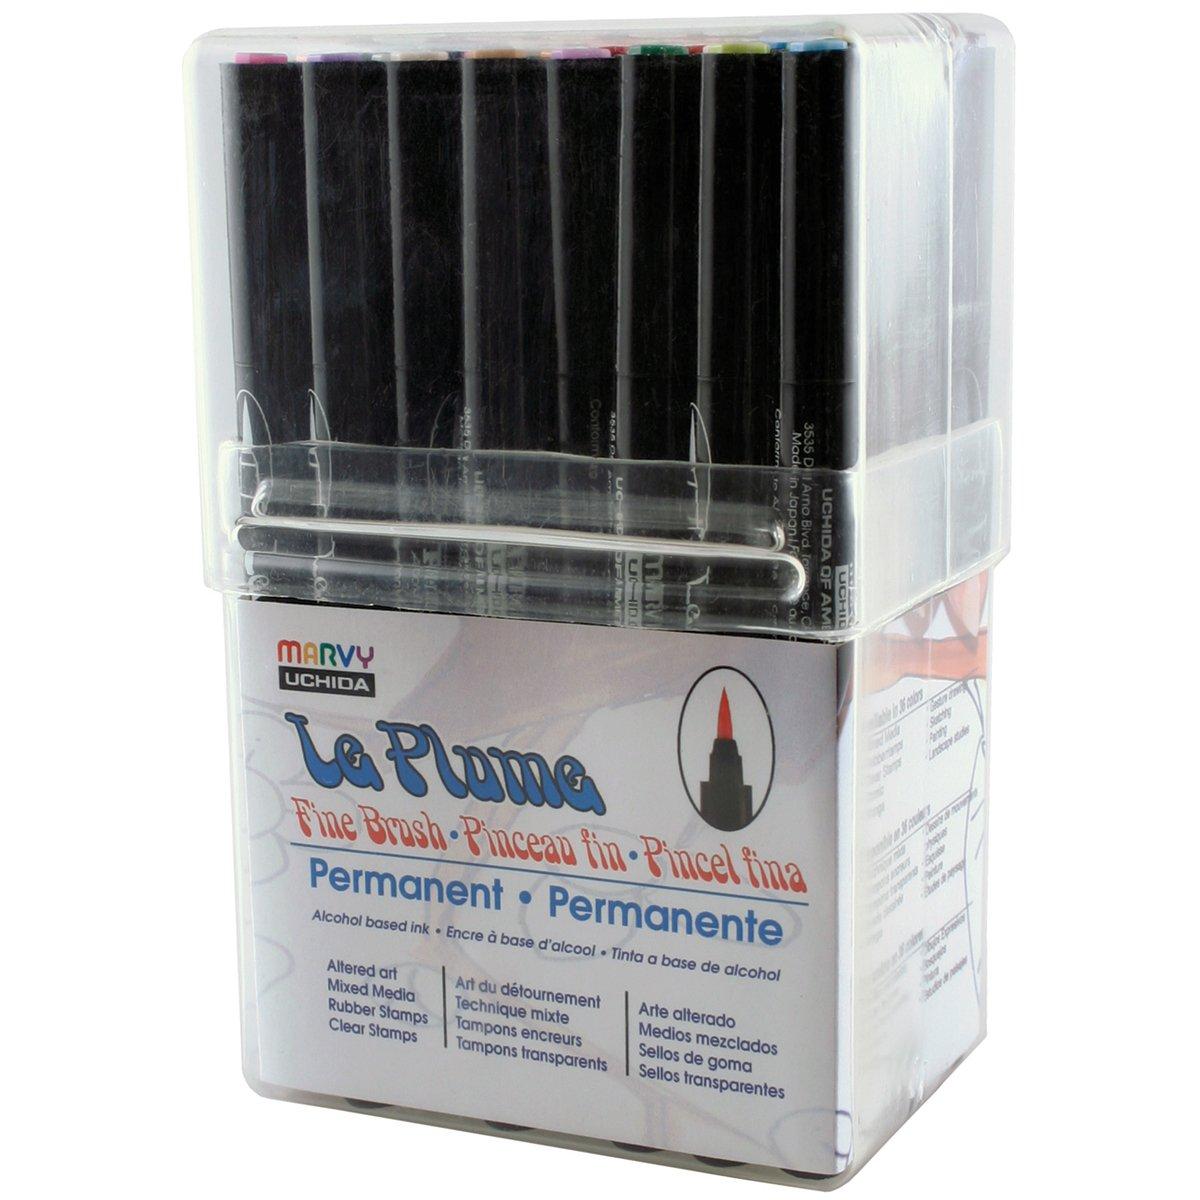 Uchida, 36 Piece, Le Plume Permanent Fine Brush Tip Markers, Alchohol Based Ink